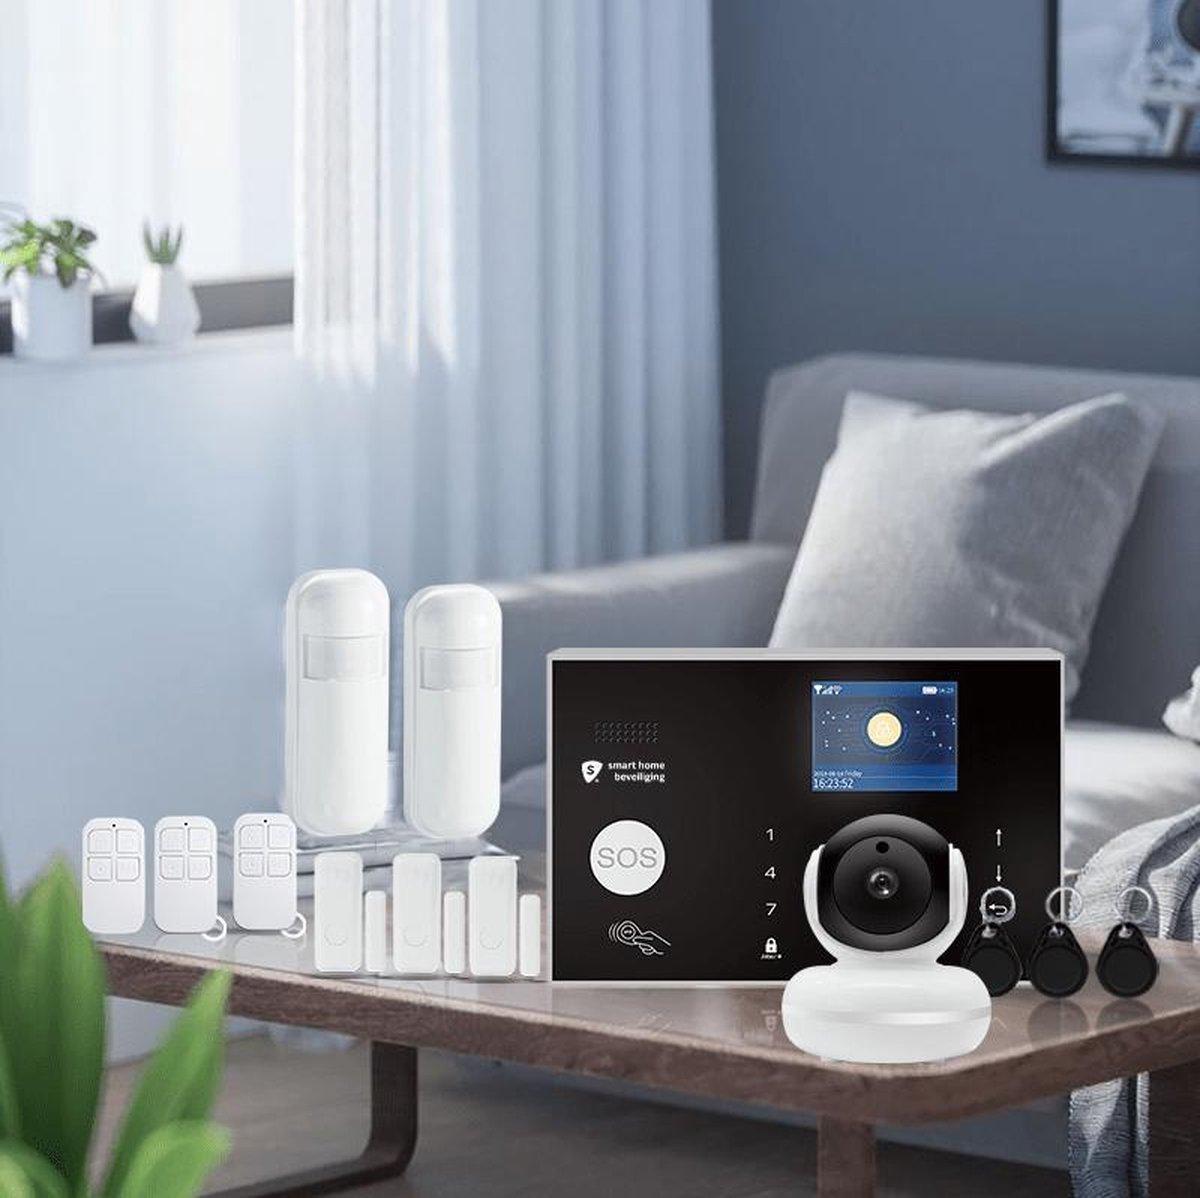 Alarmhub 2 pro alarmsysteem + indoor eye camera - Smart Home Beveiliging - Melding via app, SMS en oproep - Cijfercode - RFID tag - SIM kaart - Thuis modus - Back up batterij - Intercom - Betrouwbaar alarmsysteem - Google home, Alexa en IFTTT